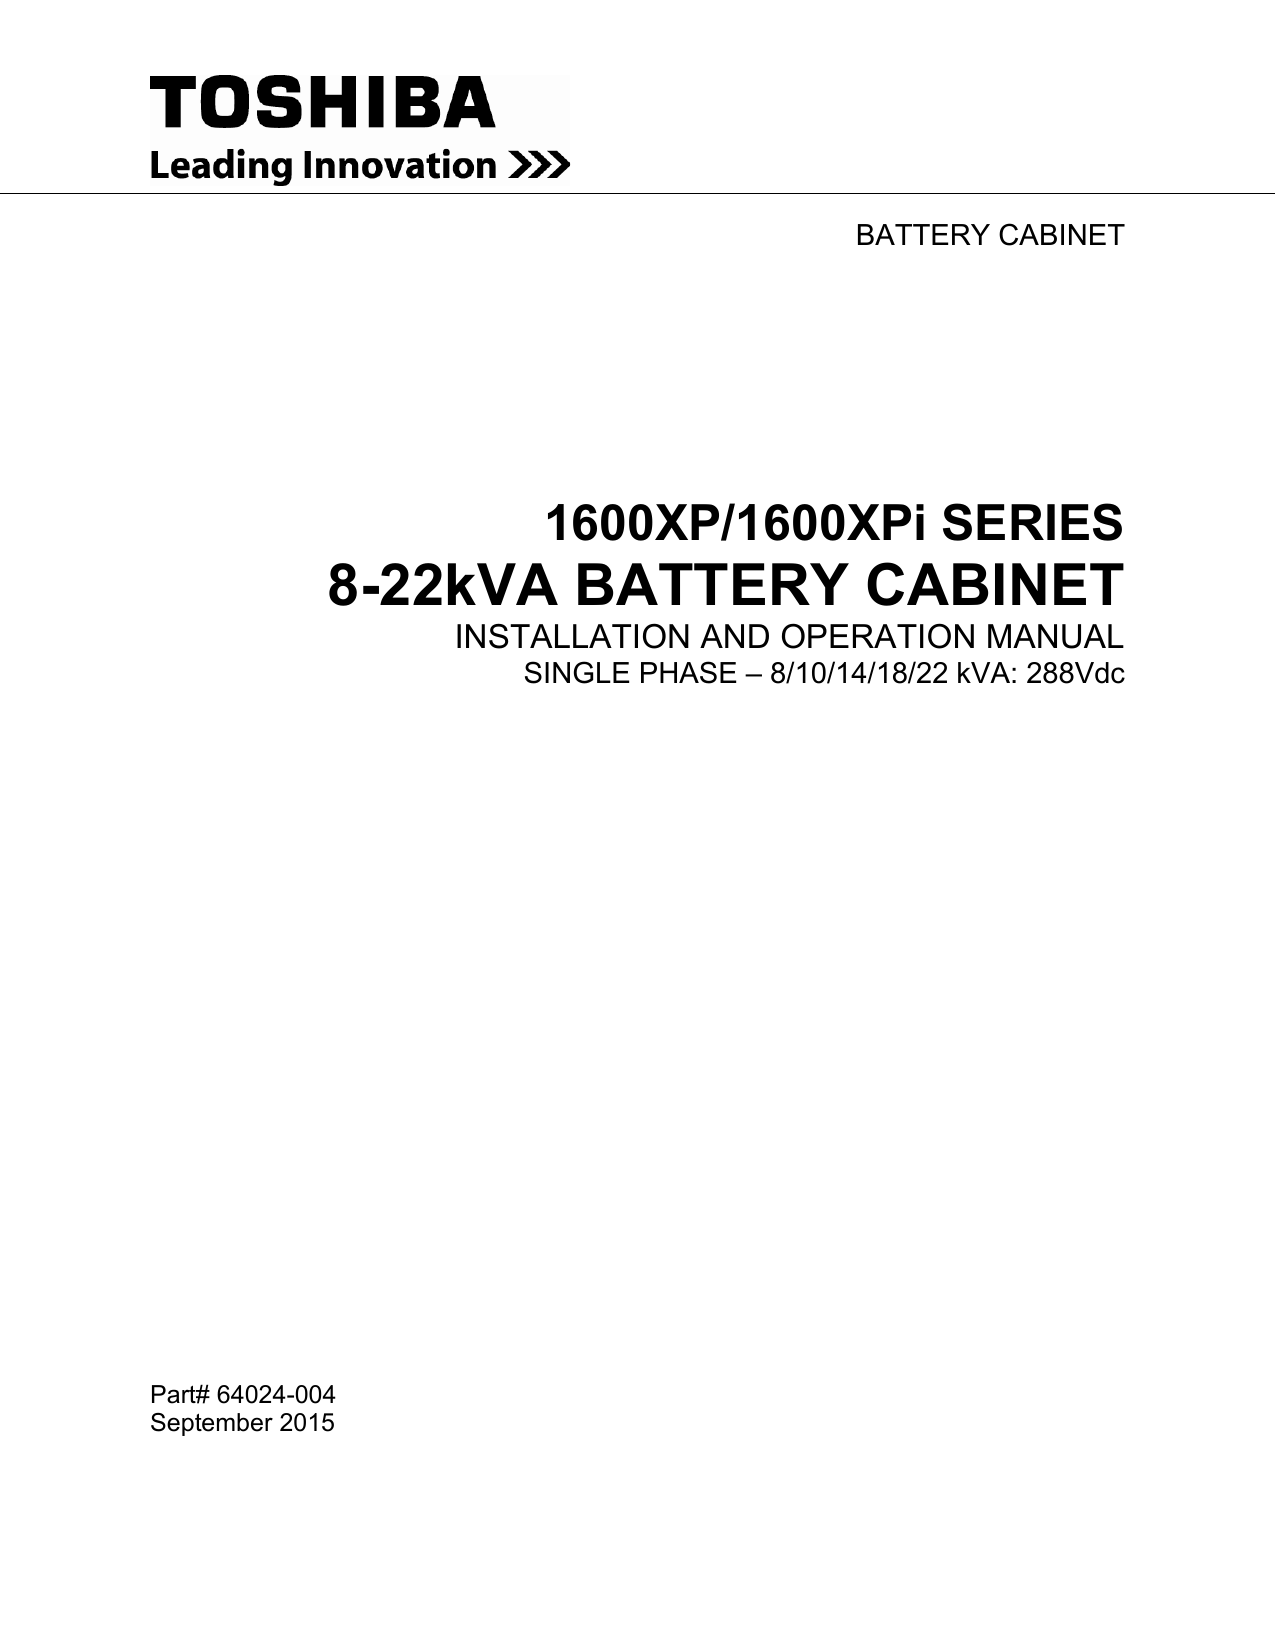 hight resolution of 1600xp xpi series ups battery cabinet manual 8 22kva